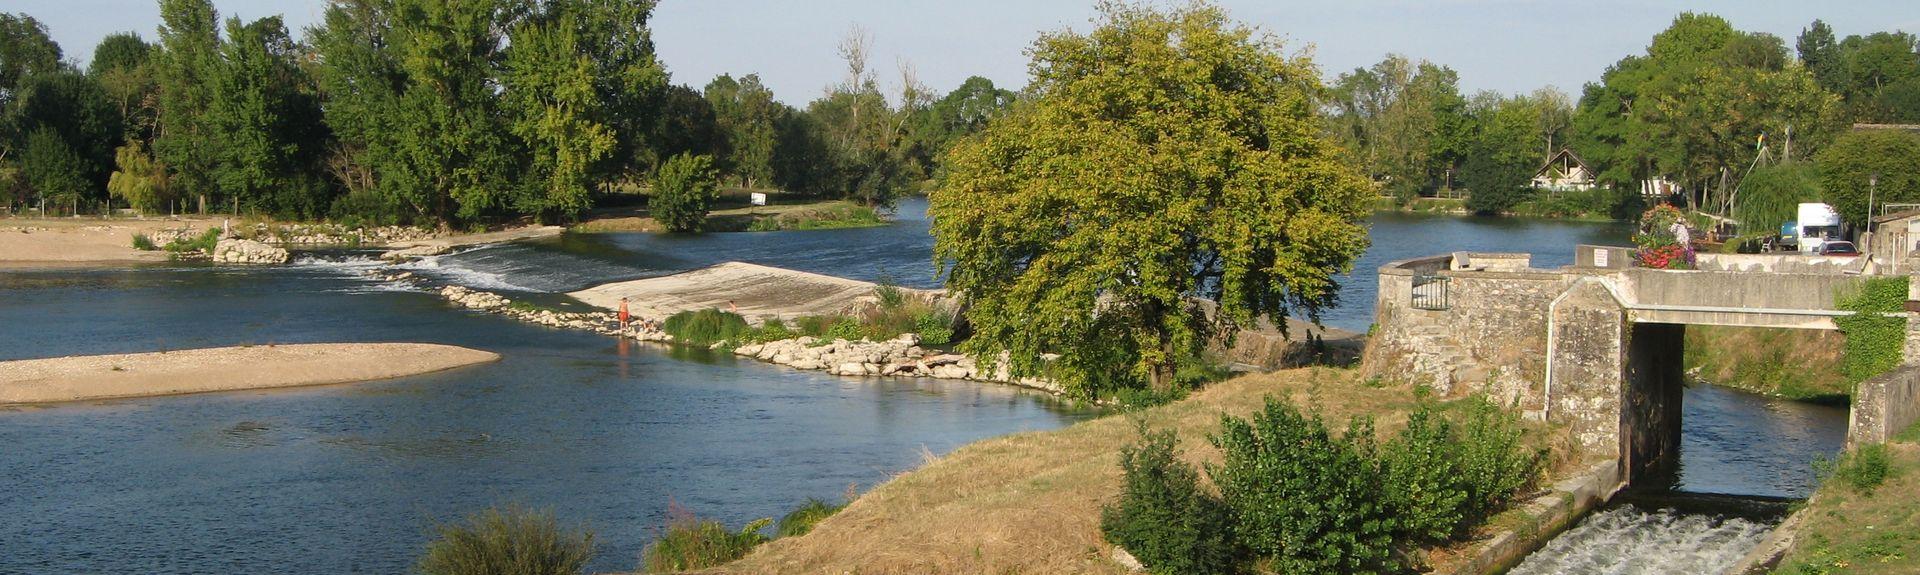 Tours, Centre - Loirevallei, Frankrijk